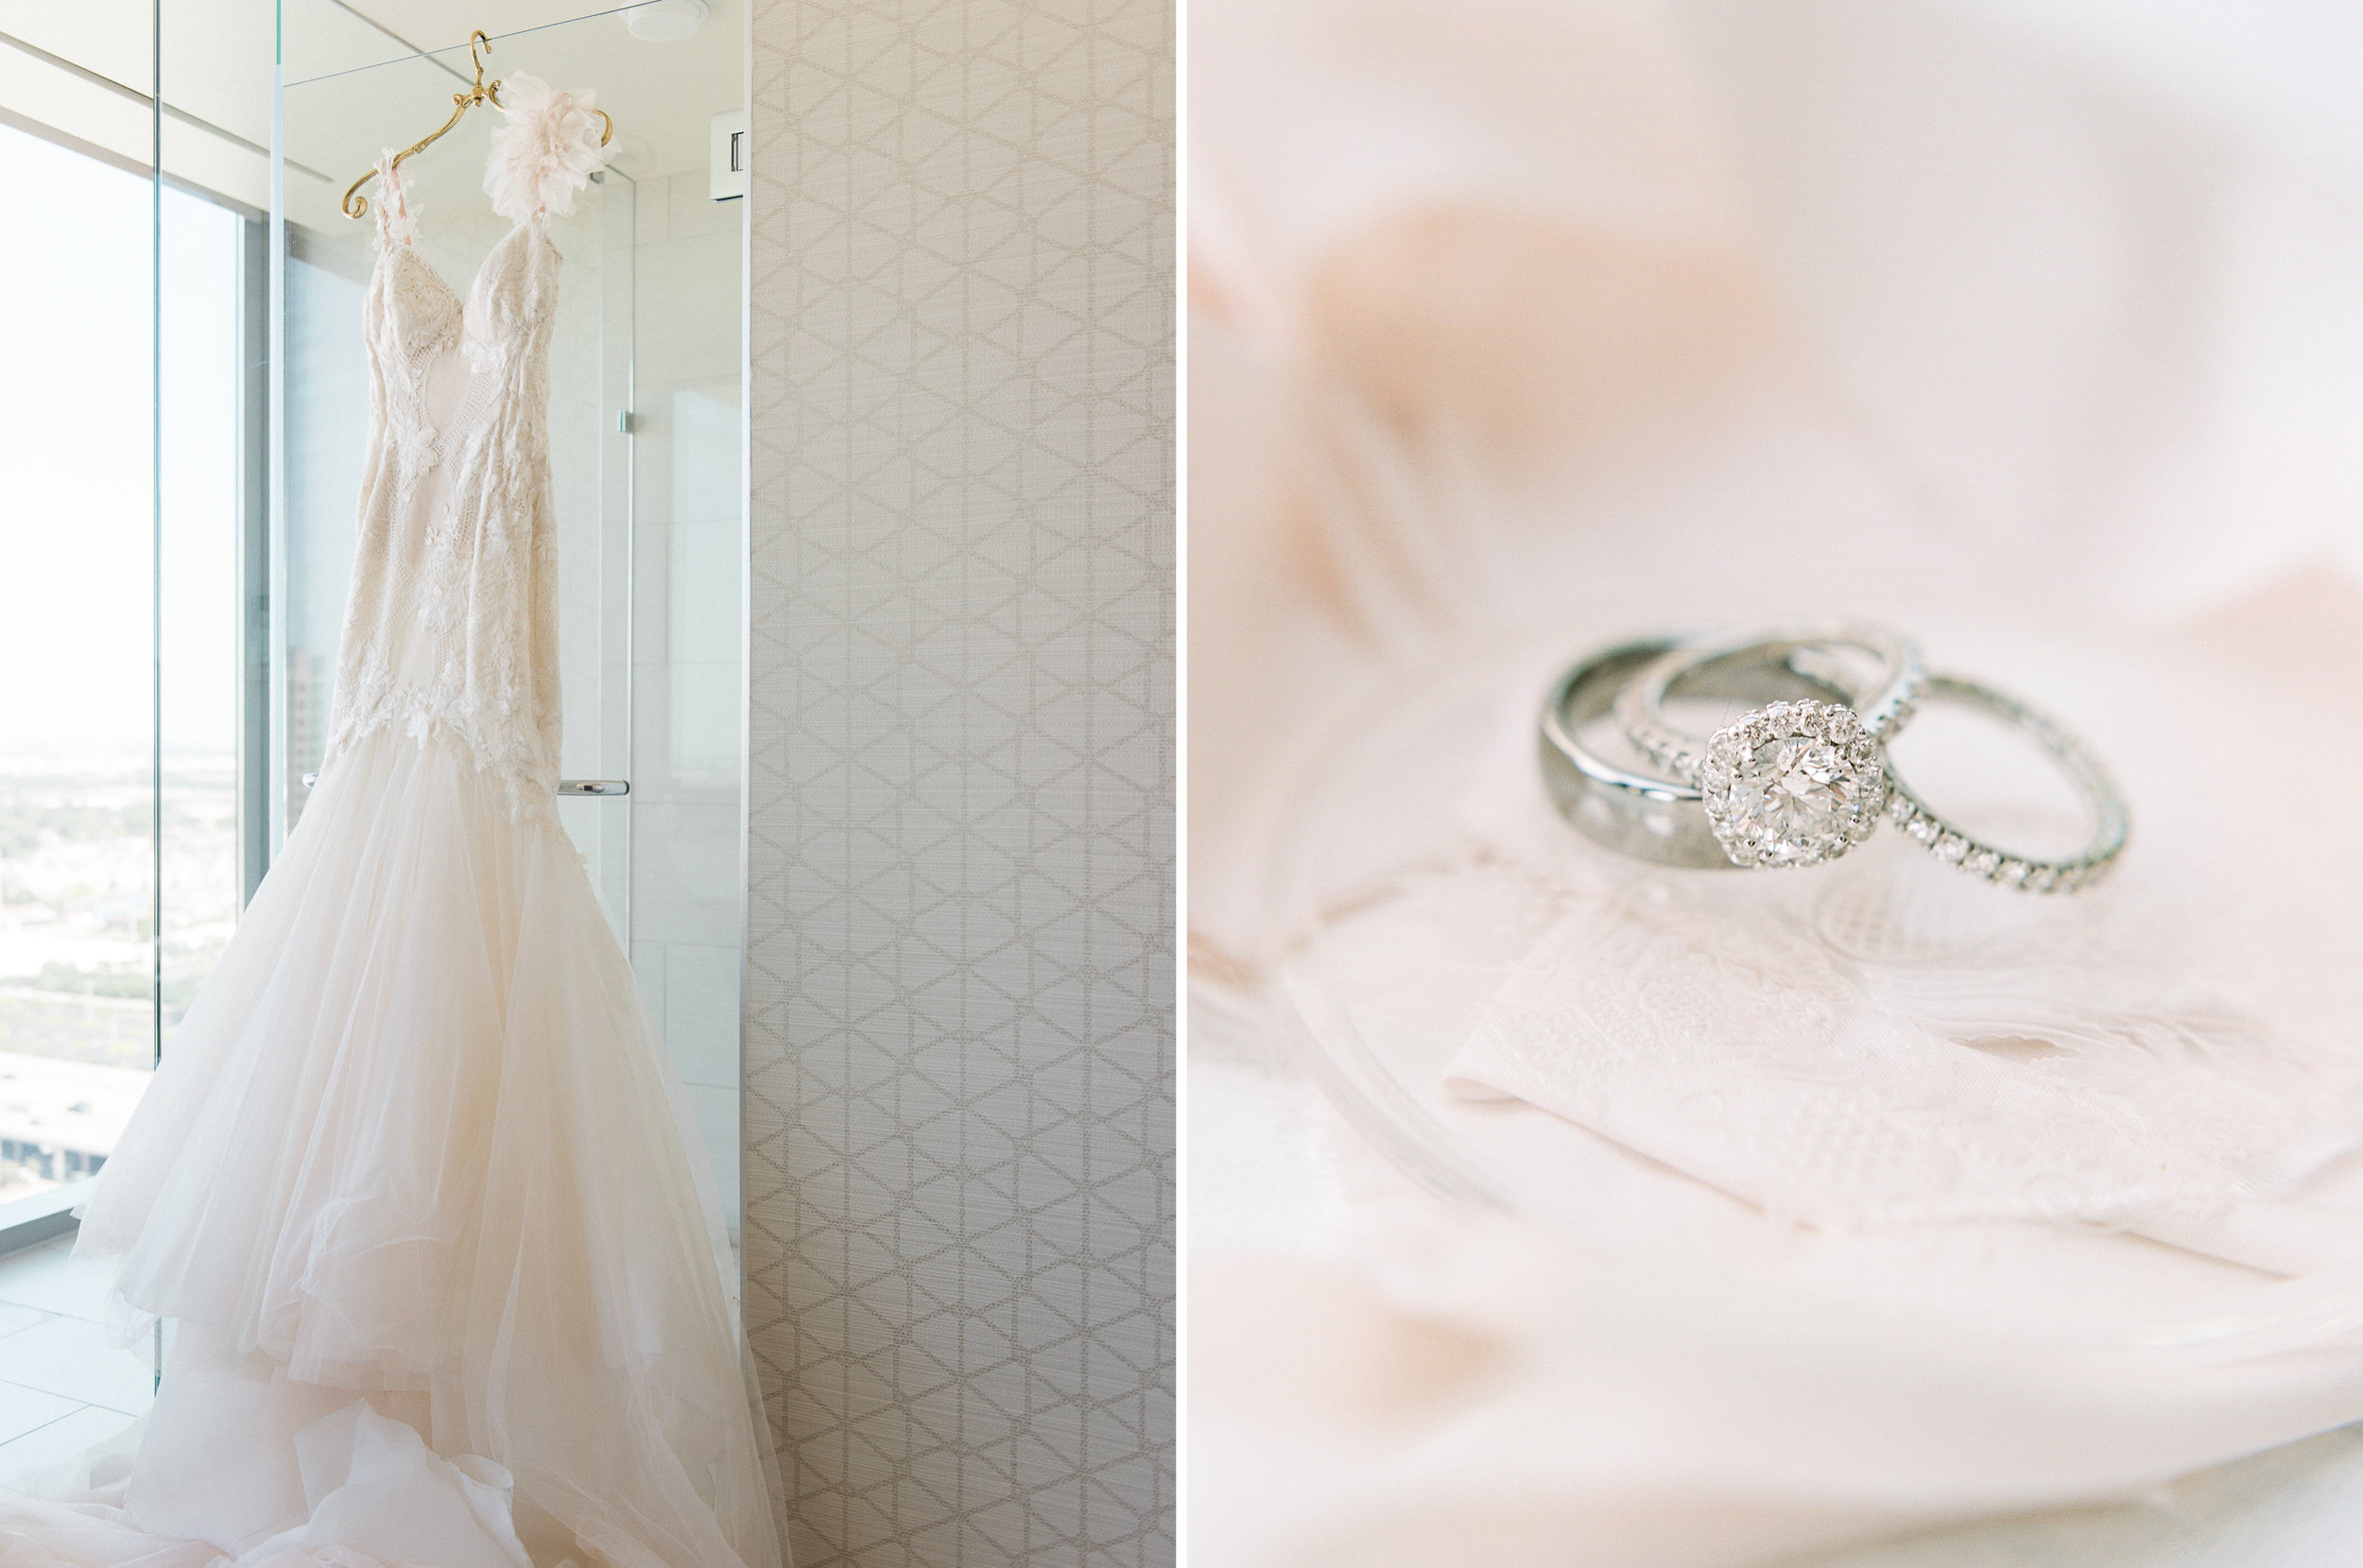 Martha-Stewart-Wedding-Dana-Fernandez-Photography-Josh-Texas-Film-Houston-Wedding-Fine-Art-Photographer-McGovern-Centennial-Gardens-Top-Best-105.jpg